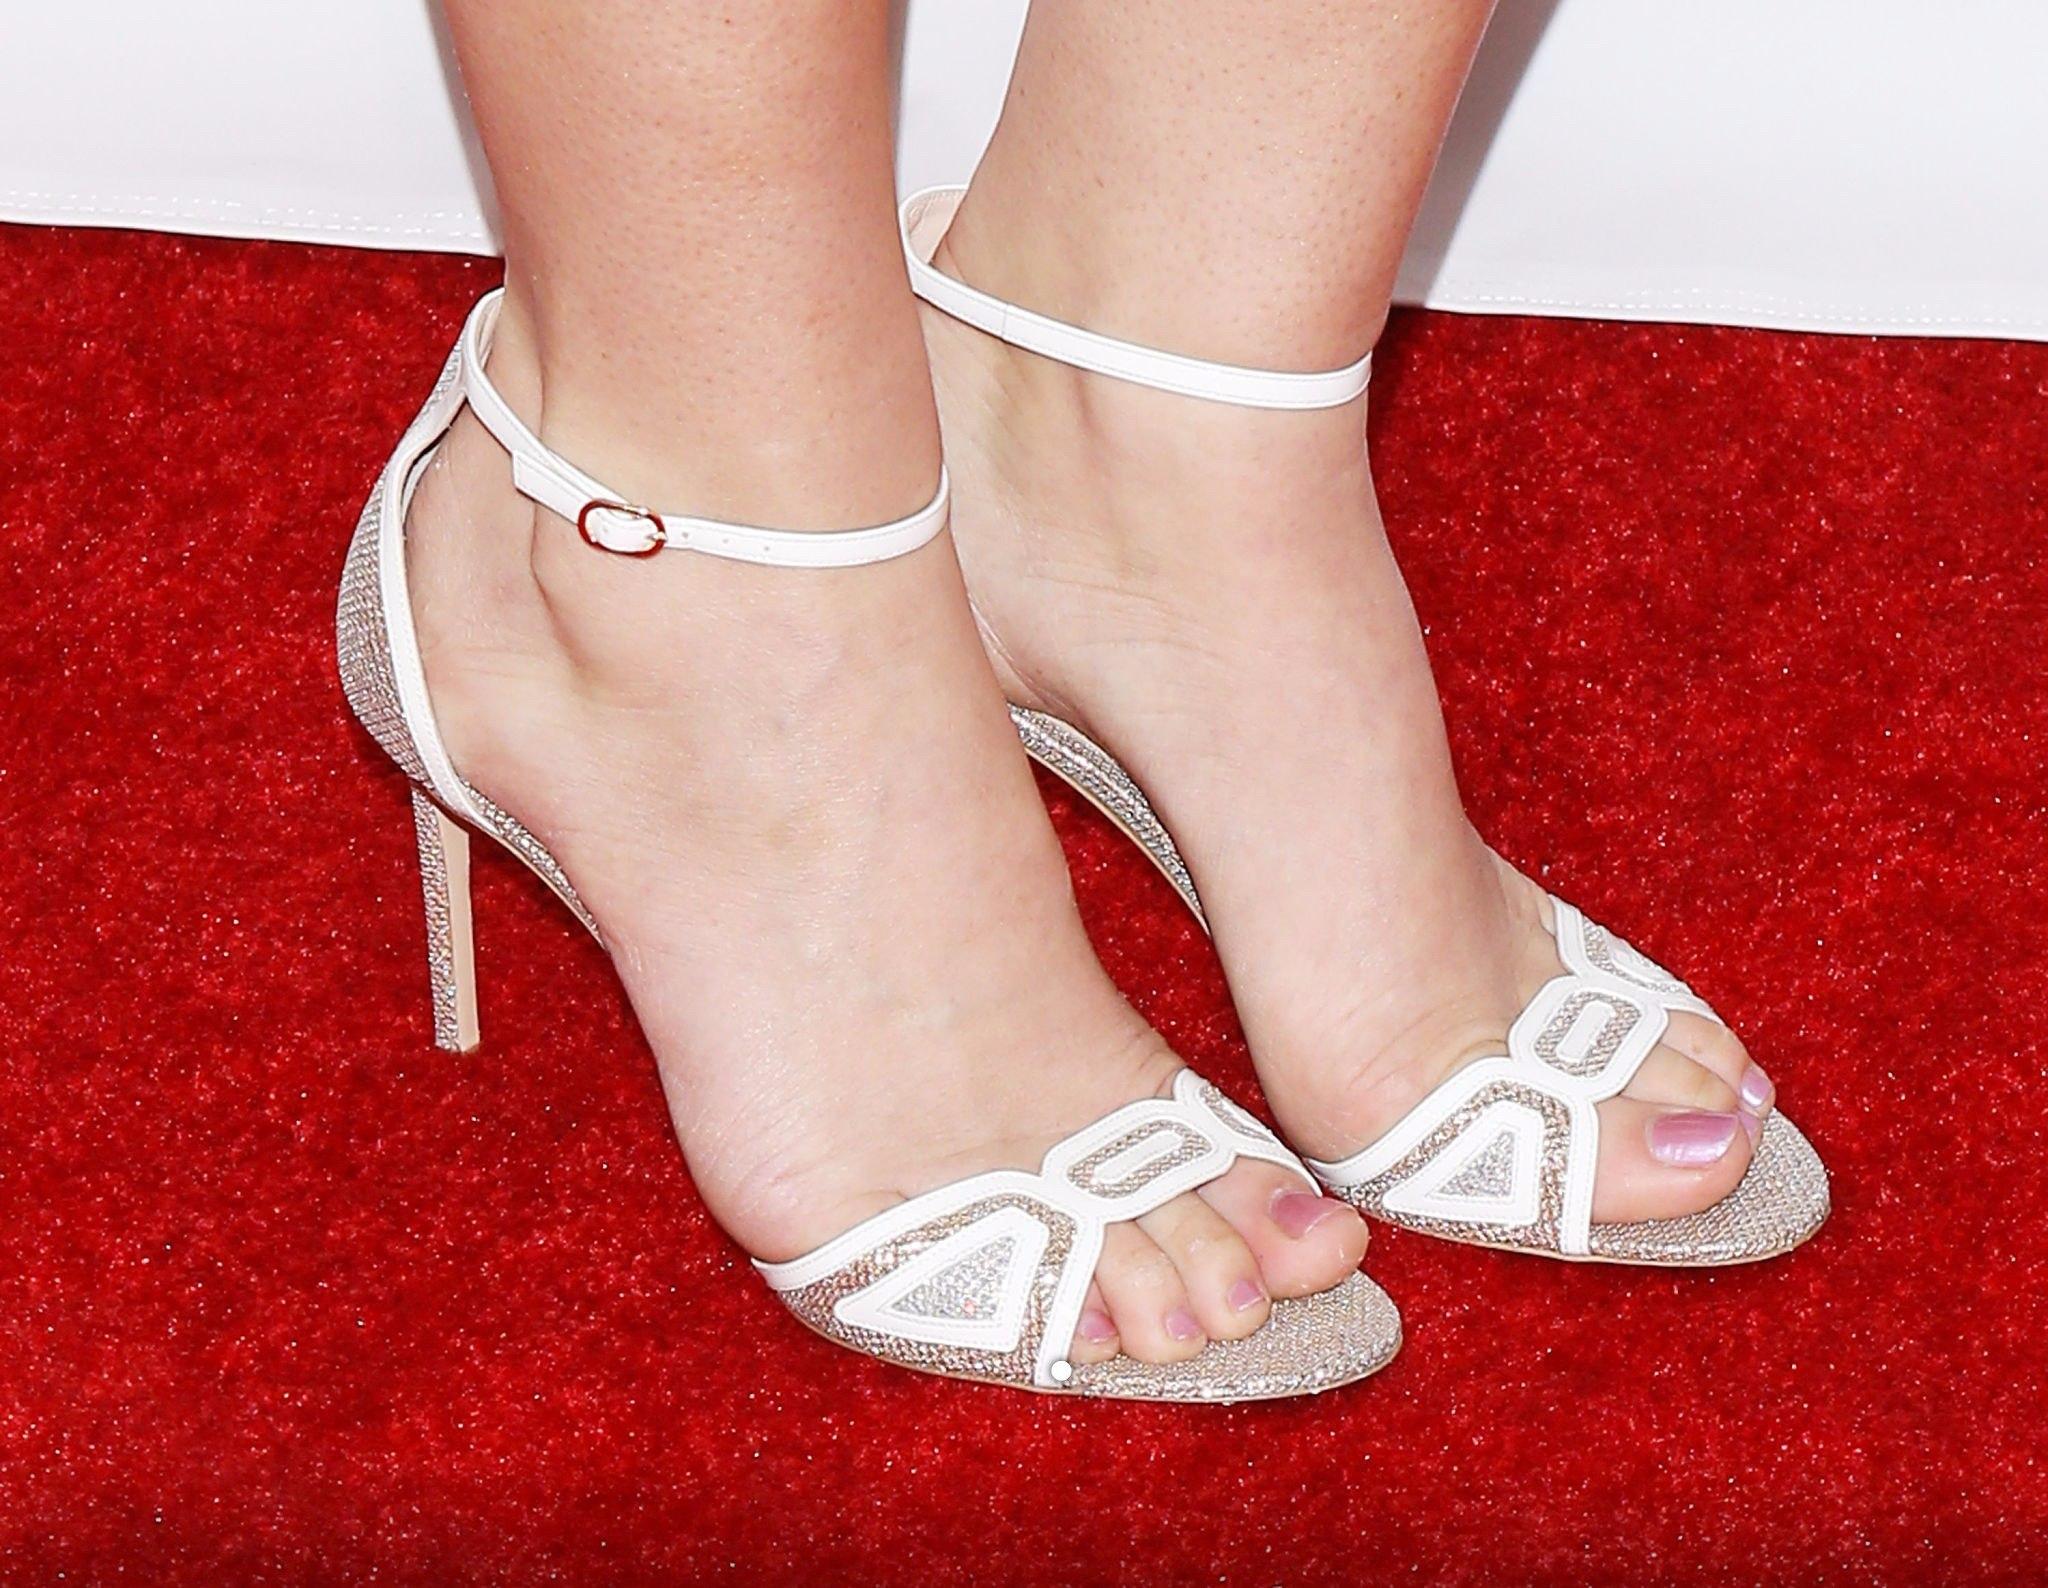 Nice and perfect feet footjob 9